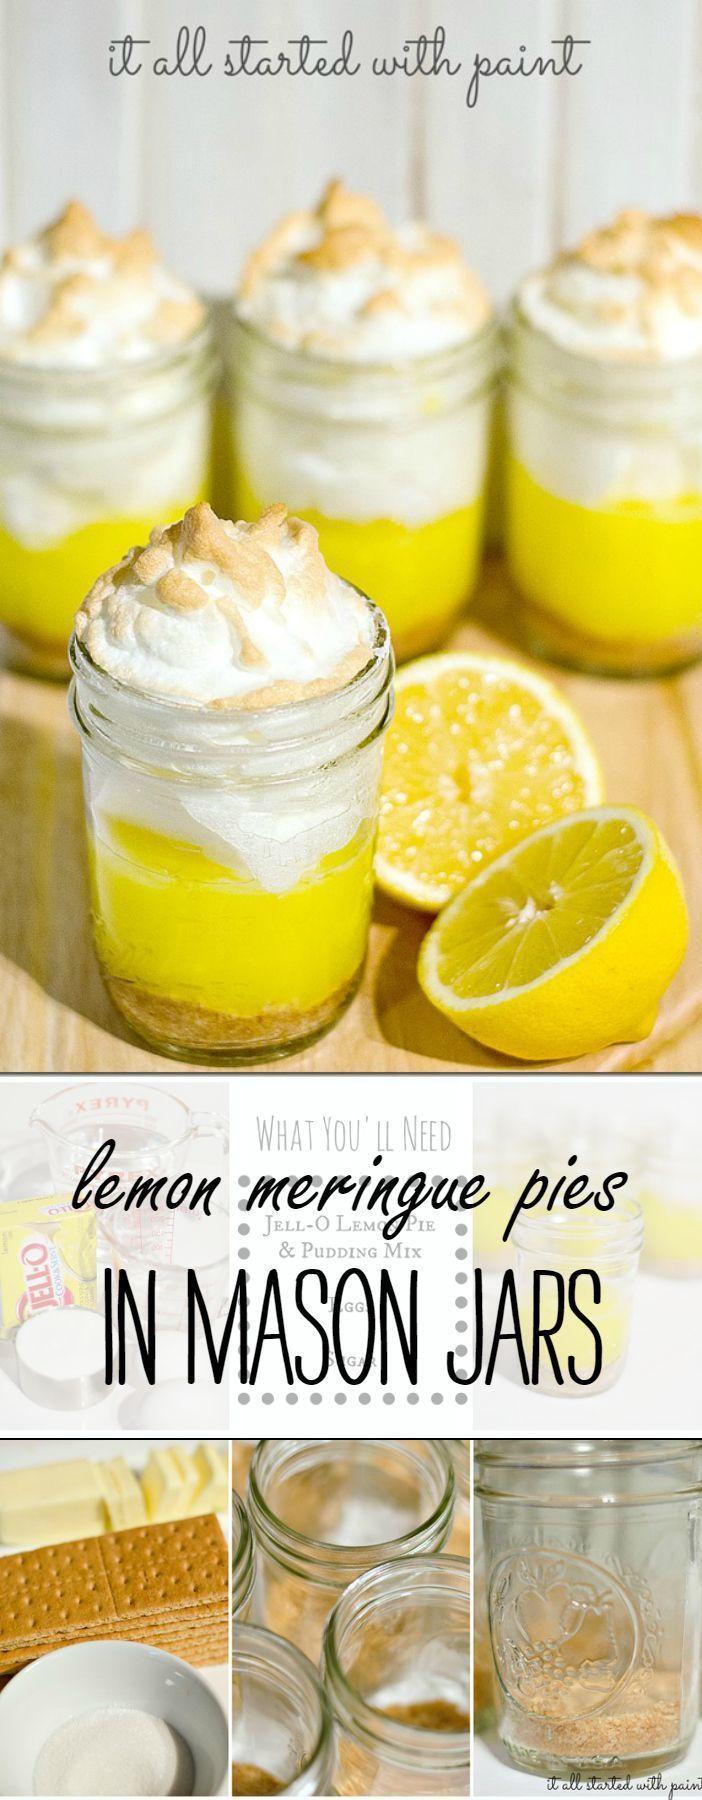 Mason Jar Lemon Meringue Pies: Single Serve Dessert Ideas